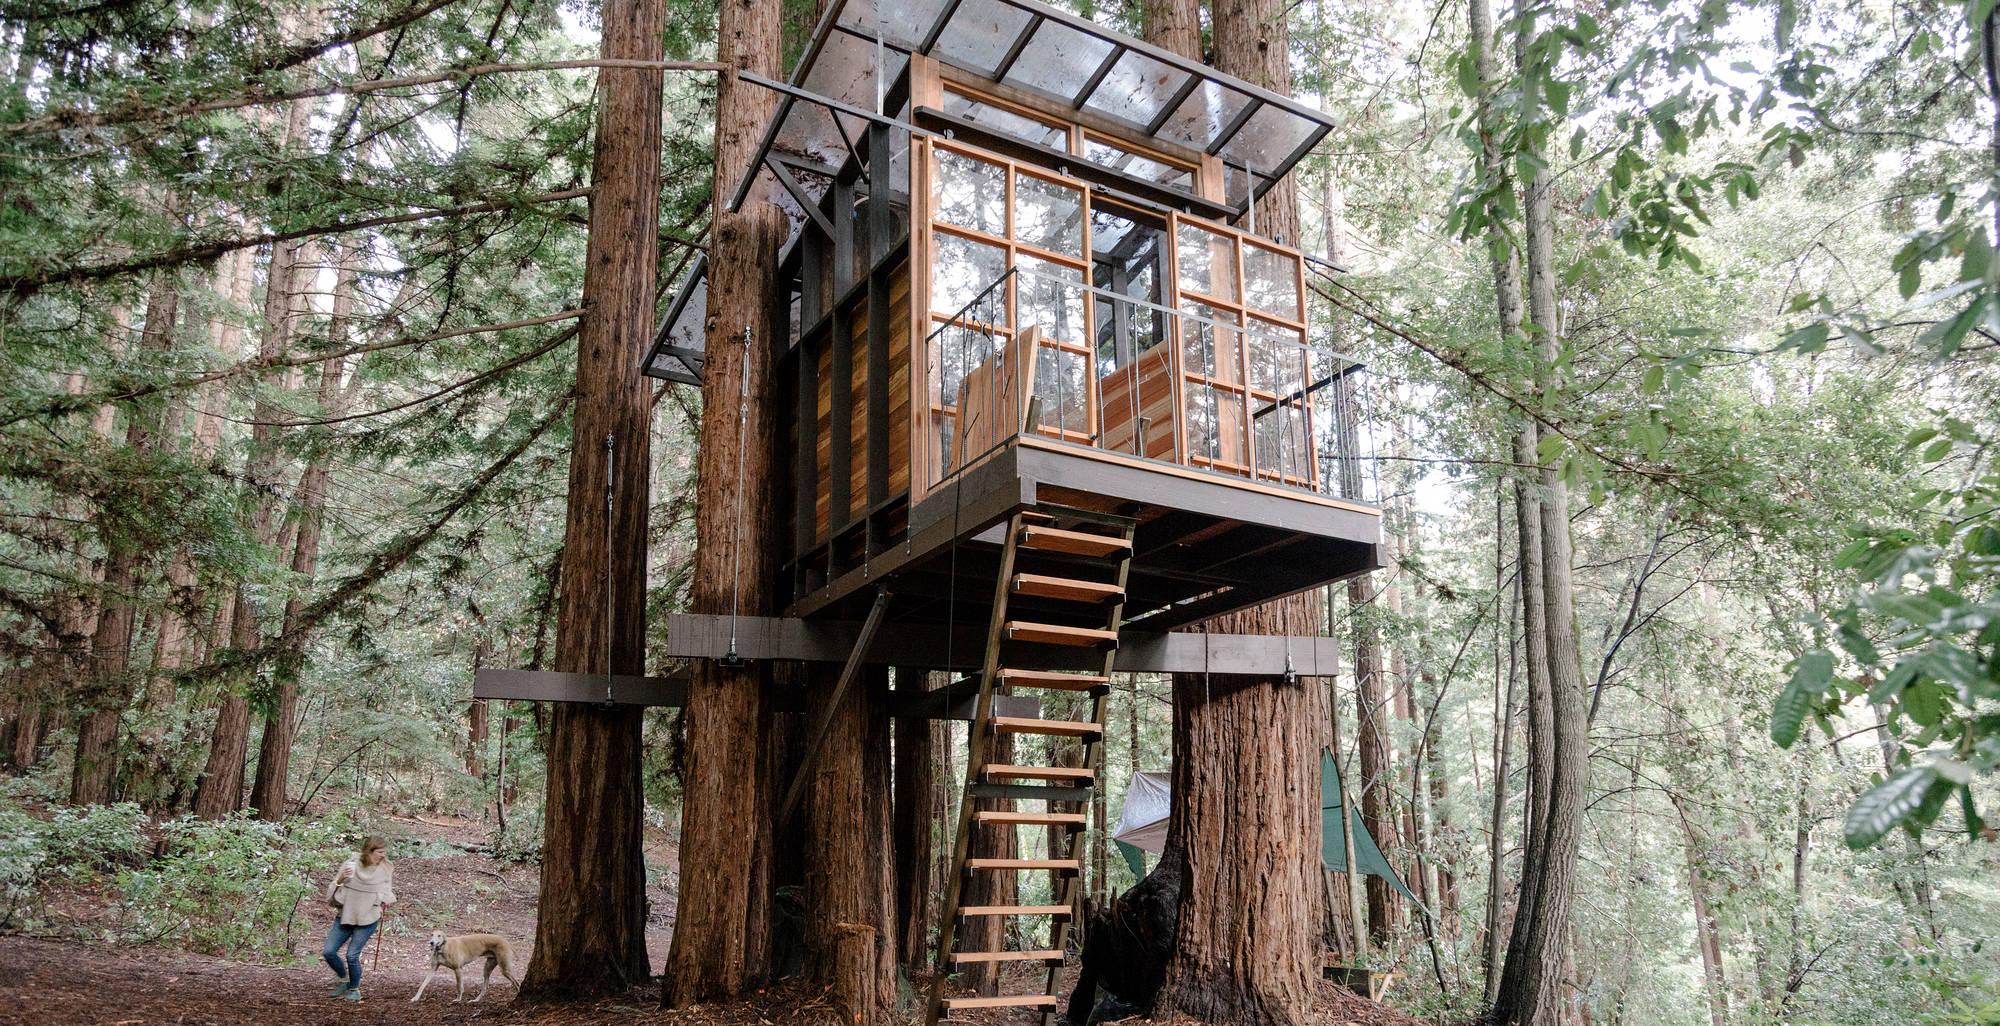 Tree Houses For Grown Ups Wsj